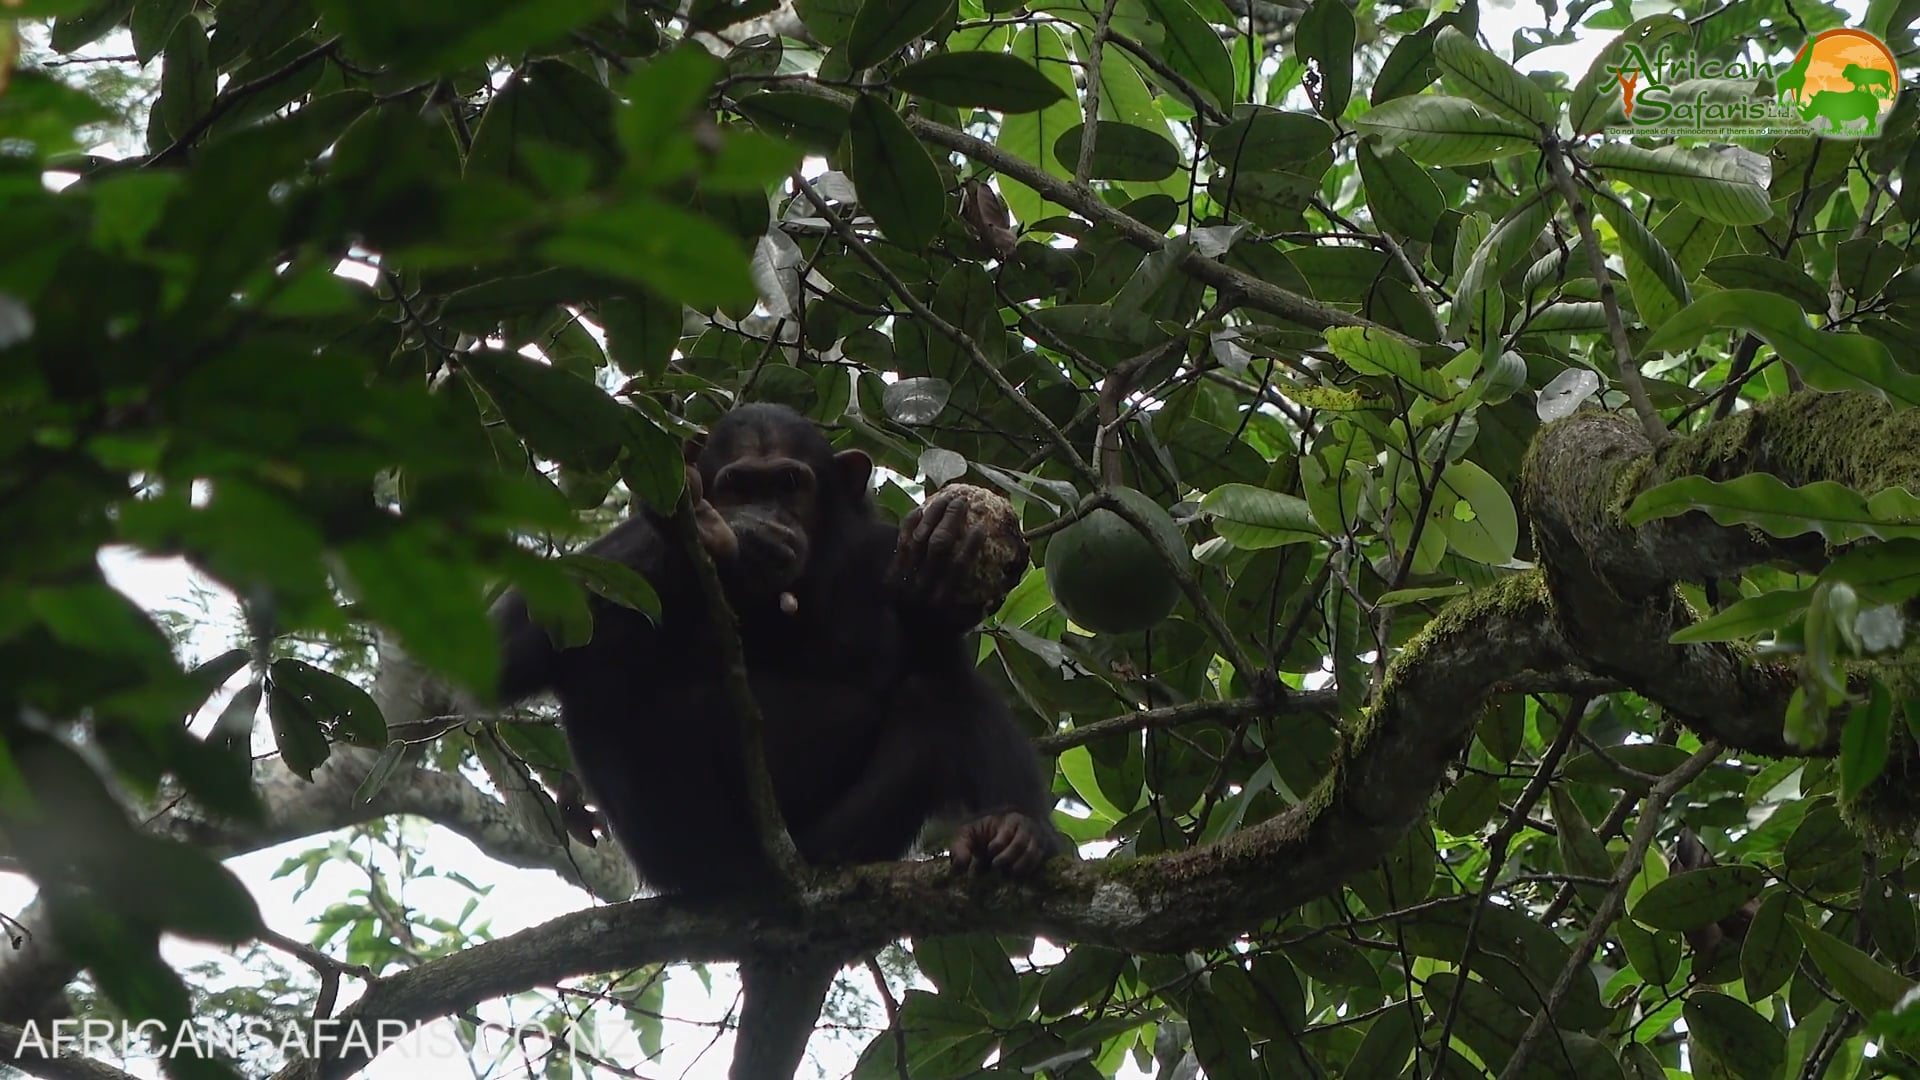 Chimpanzee Tracking, Kibale National Park, Uganda